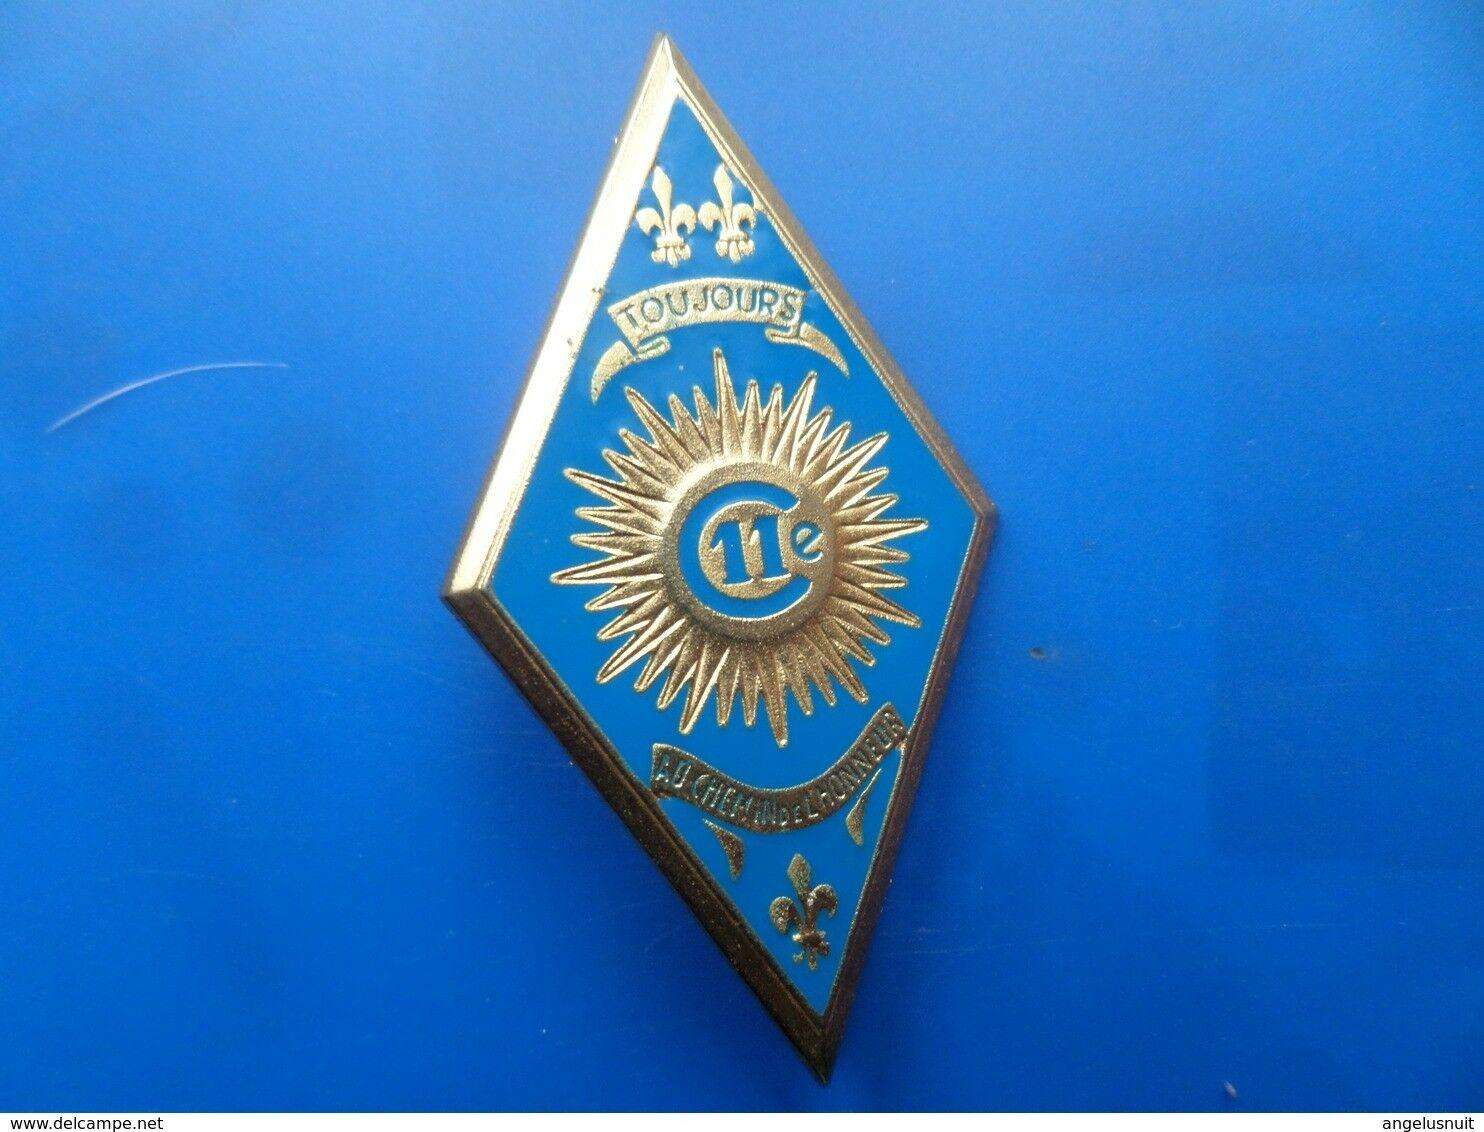 11 regiment de cuirassiers 1